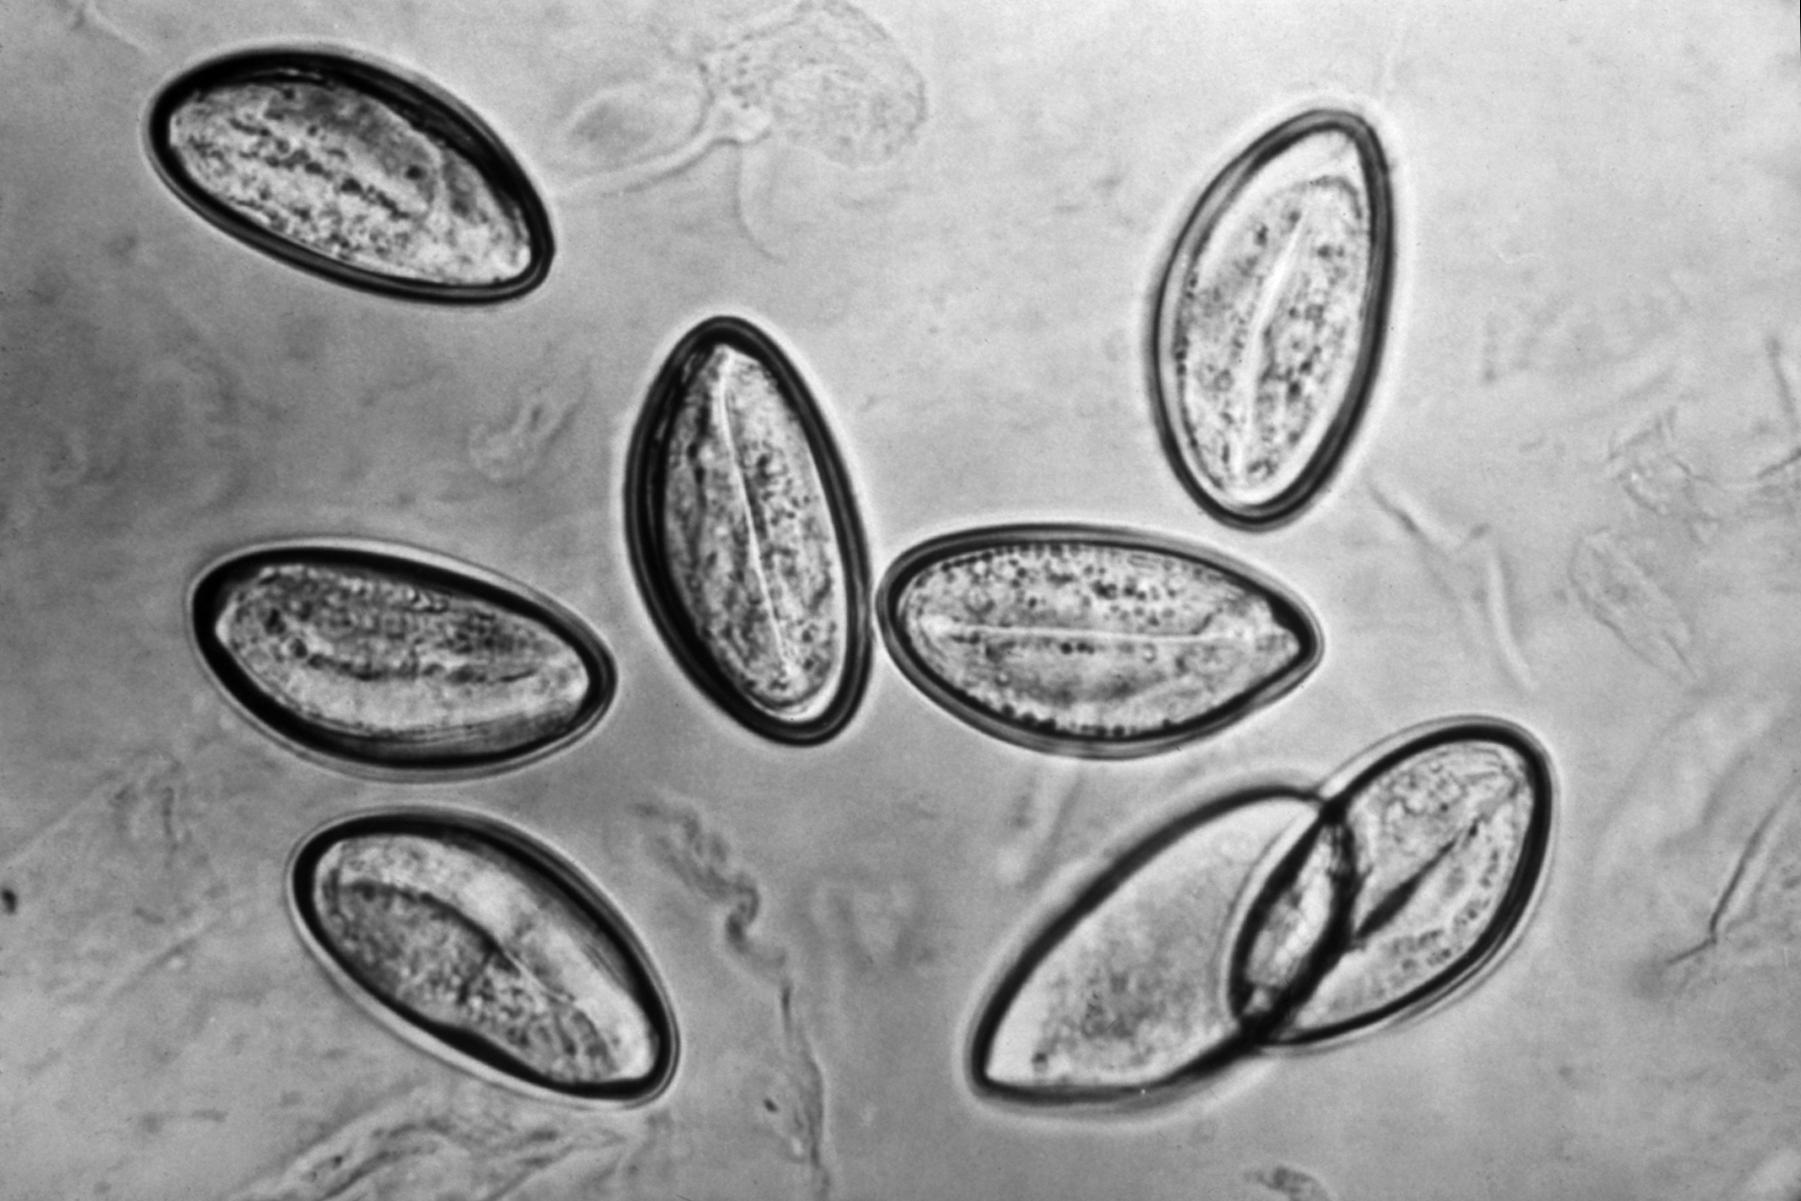 enterobius vermicularis oxyuris)